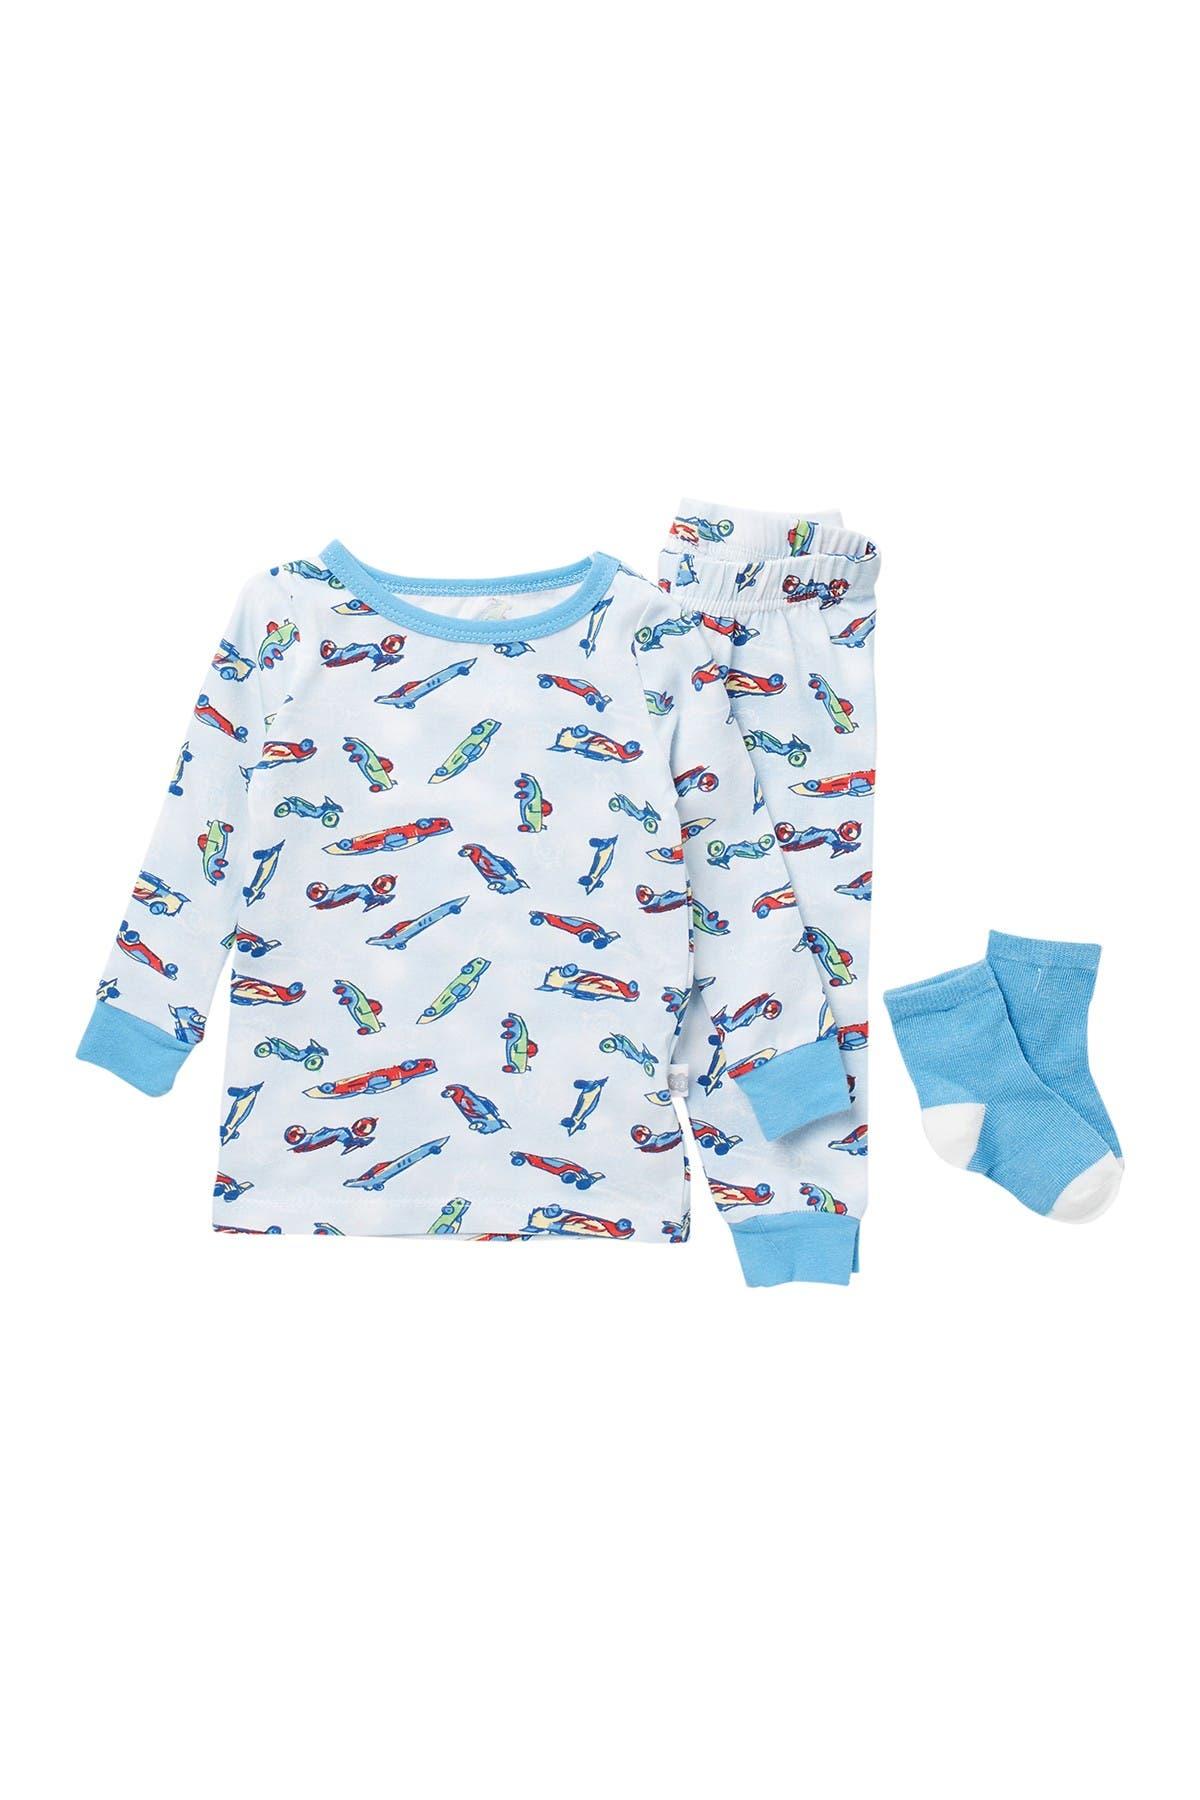 Image of CLOUD NINE 3-Piece Pajama Set with Socks